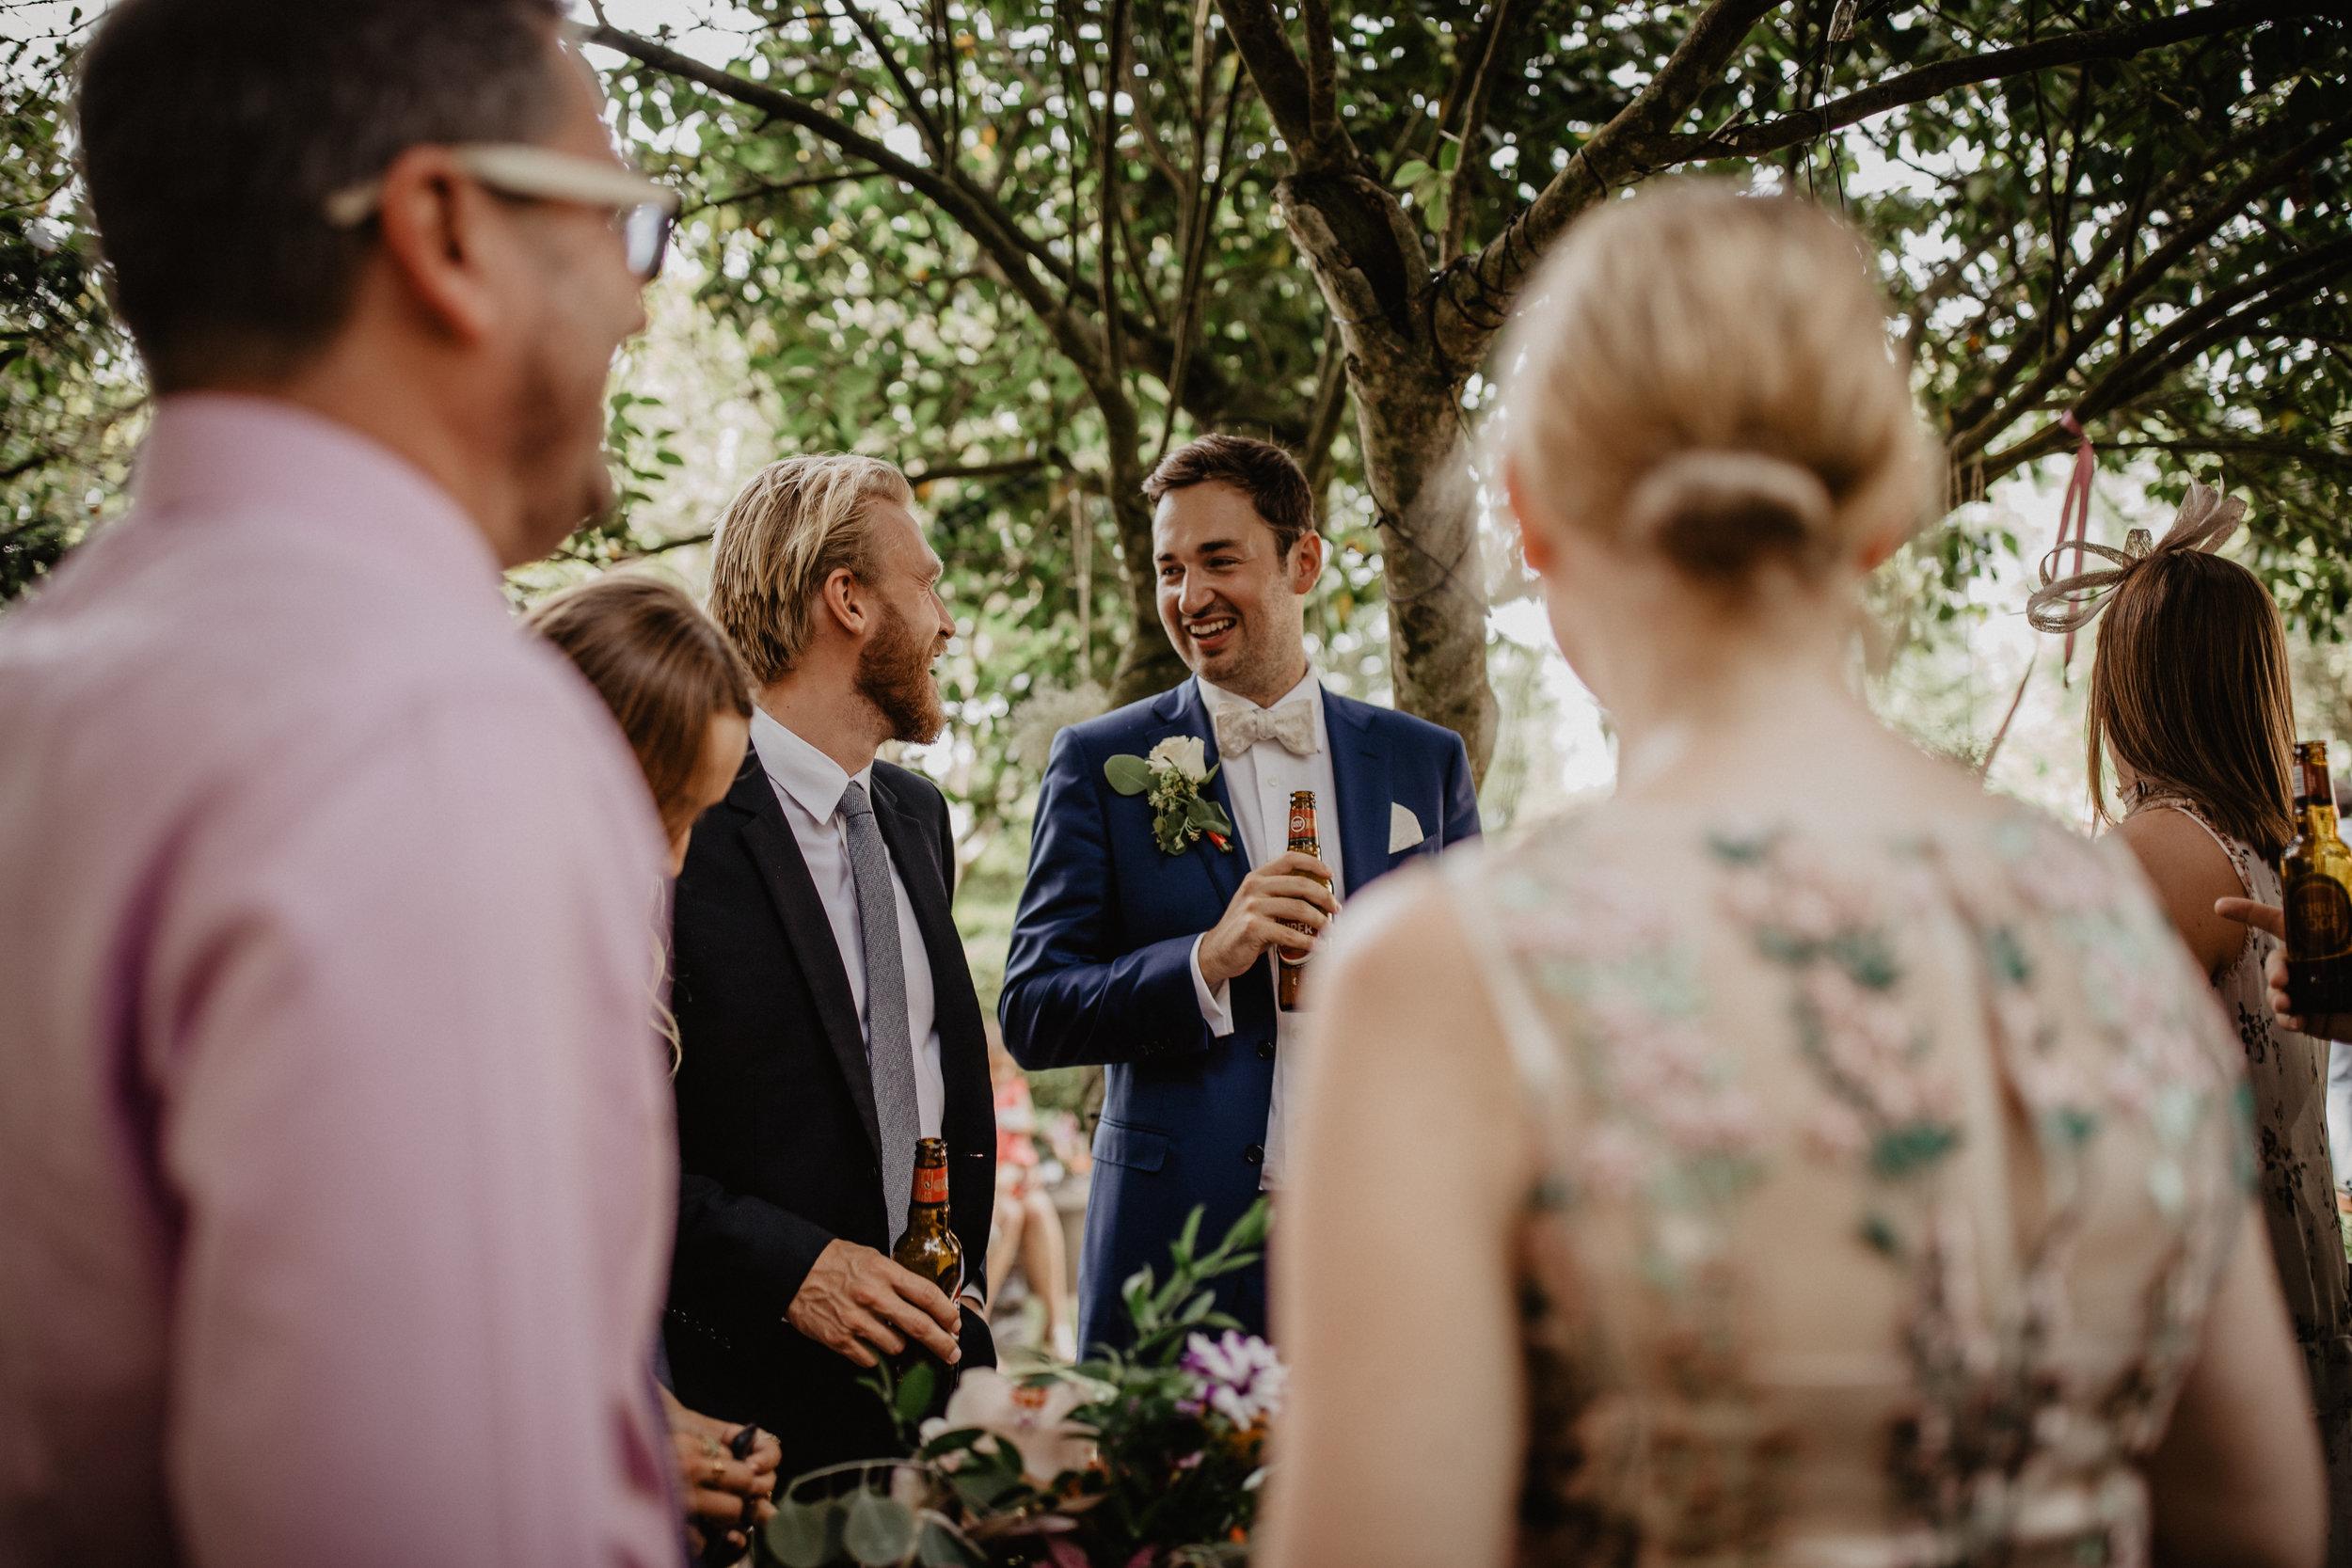 Lapela-photography-wedding-sintra-portugal-79.jpg